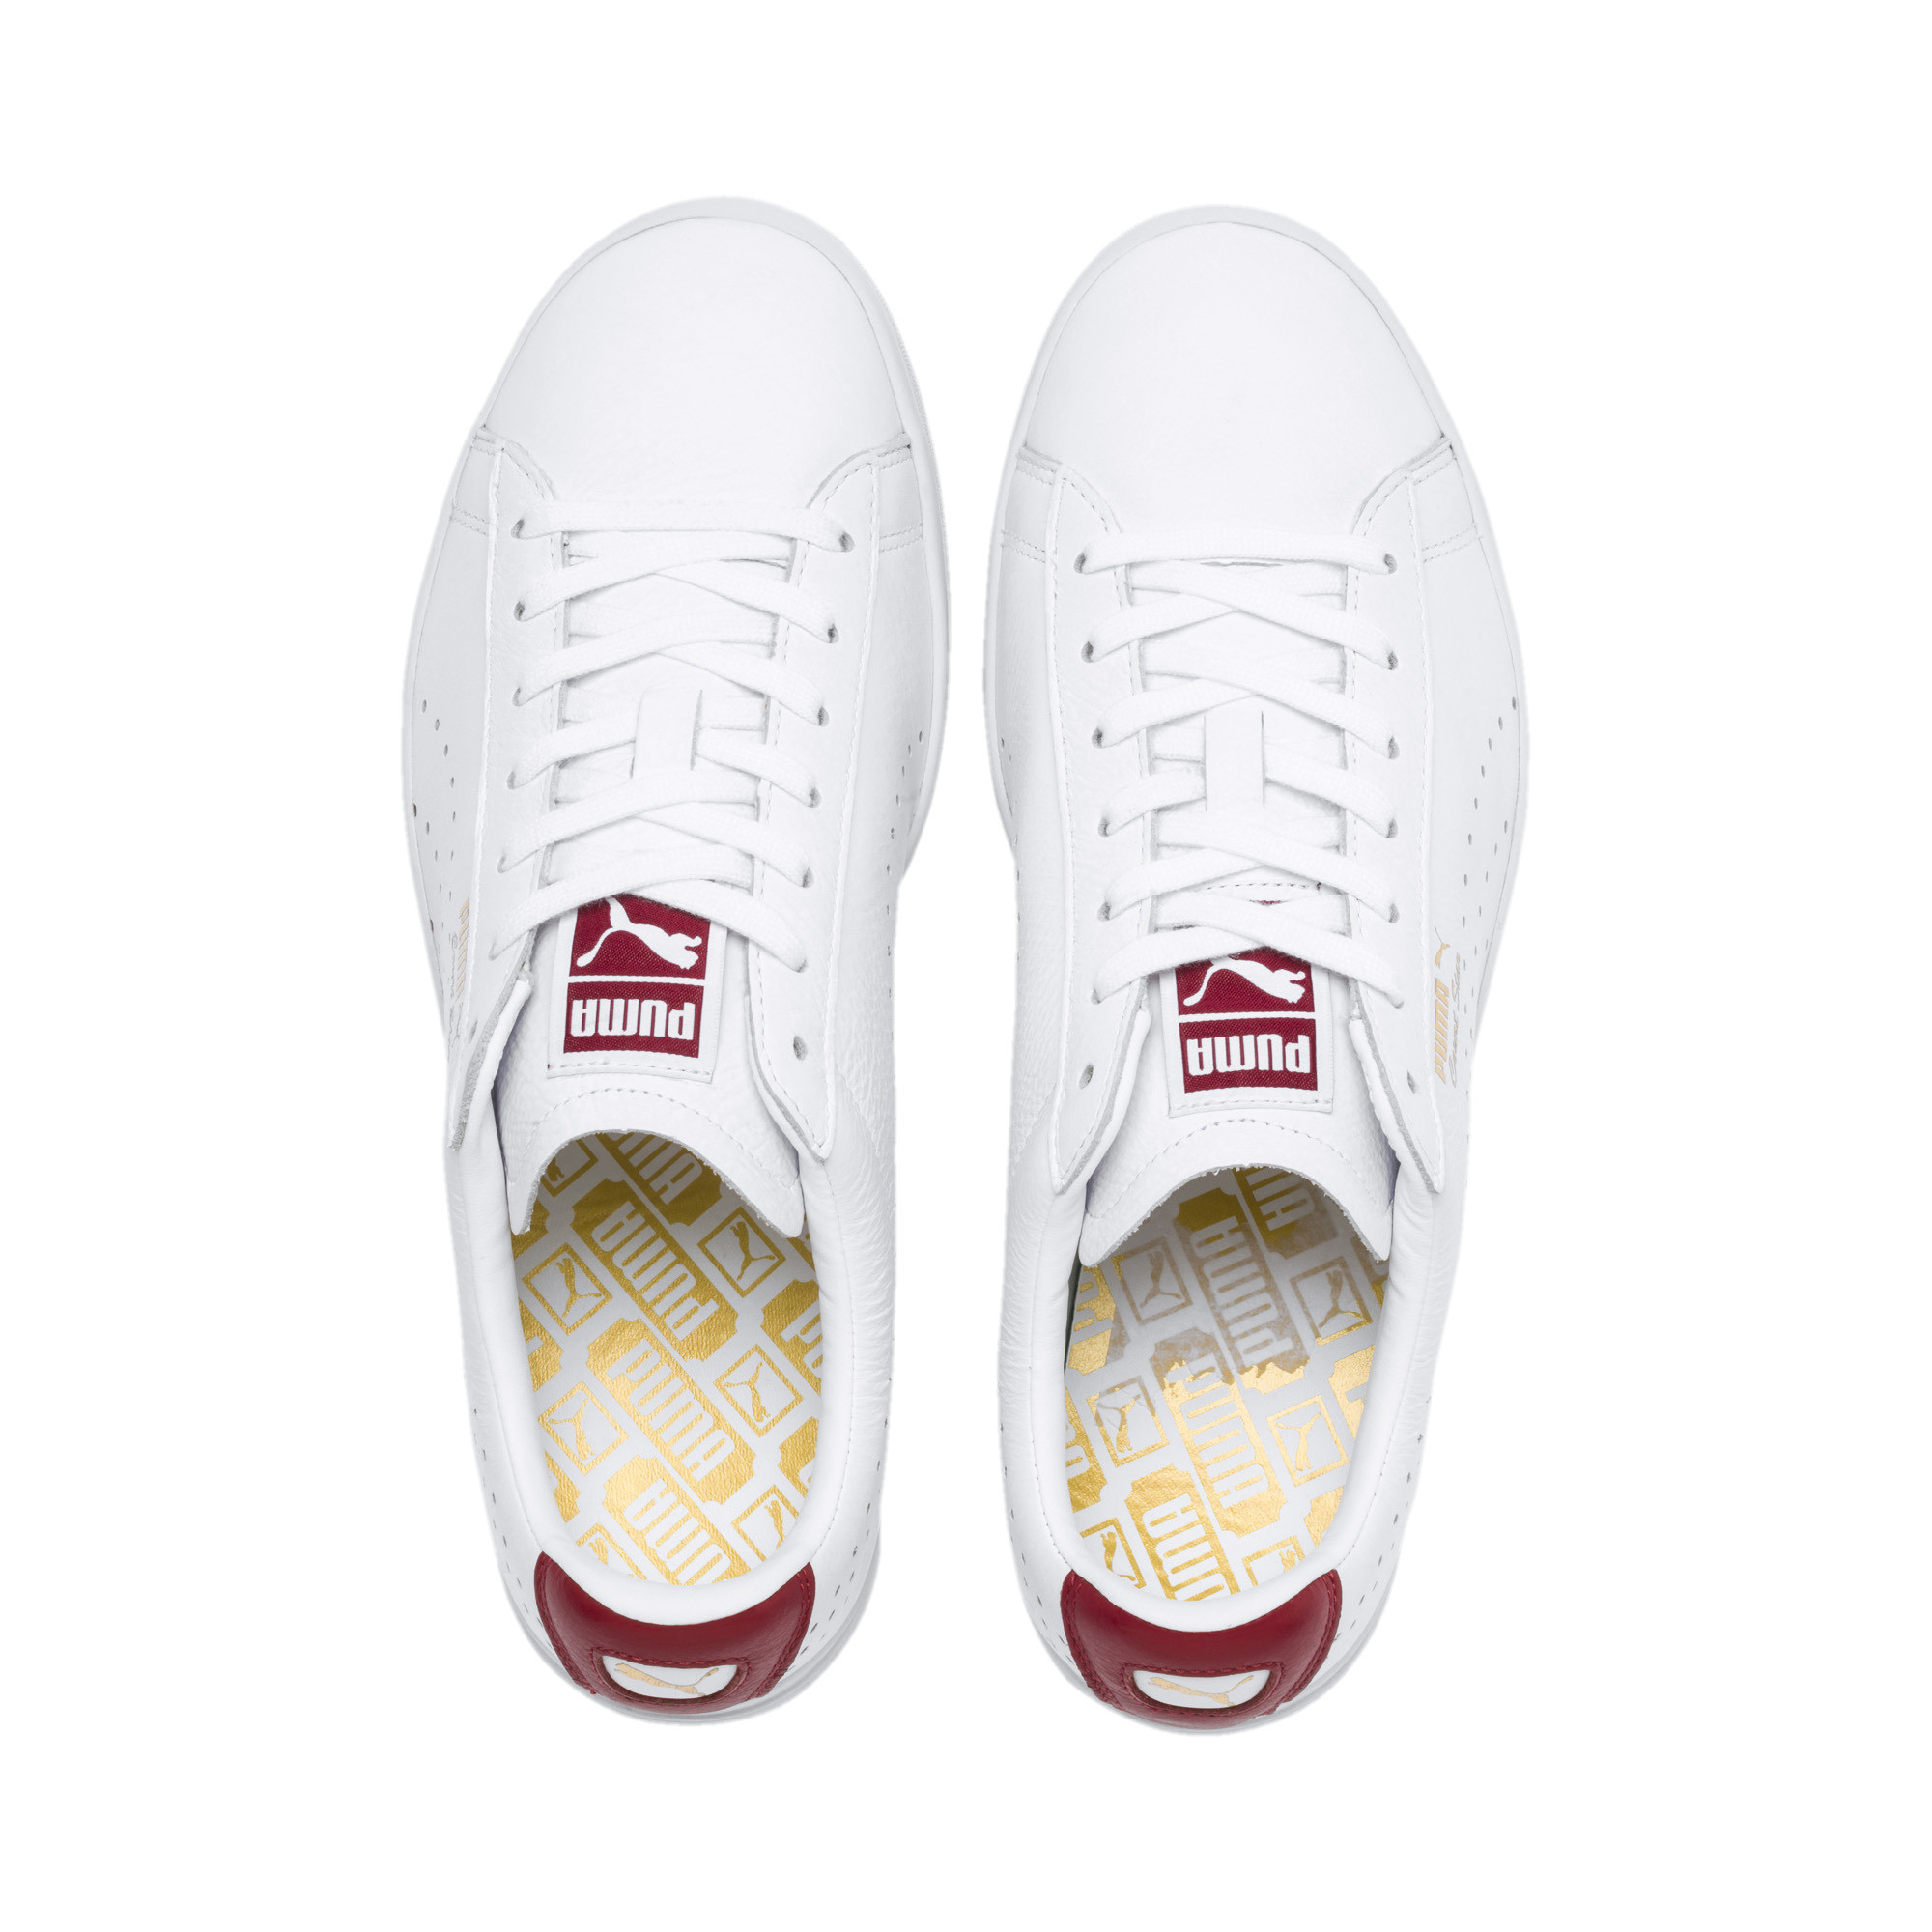 PUMA-Court-Star-Men-039-s-Sneakers-Unisex-Shoe-Sport-Classics thumbnail 15